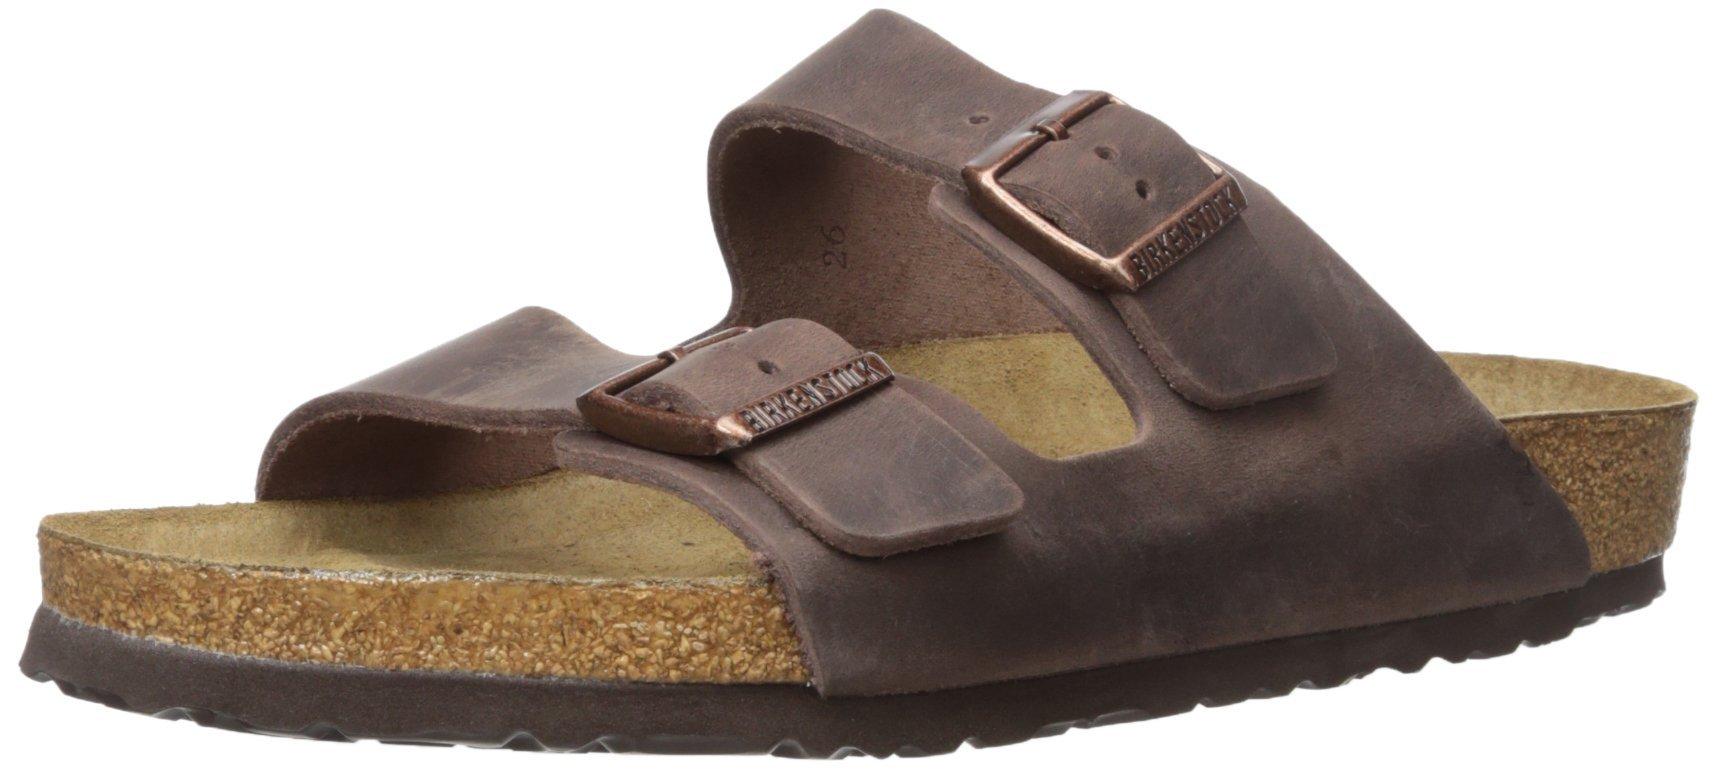 Birkenstock Arizona Sandal,Habana Oiled Leather Soft Footbed,39 M EU/8-8.5 B(M) US Women by Birkenstock